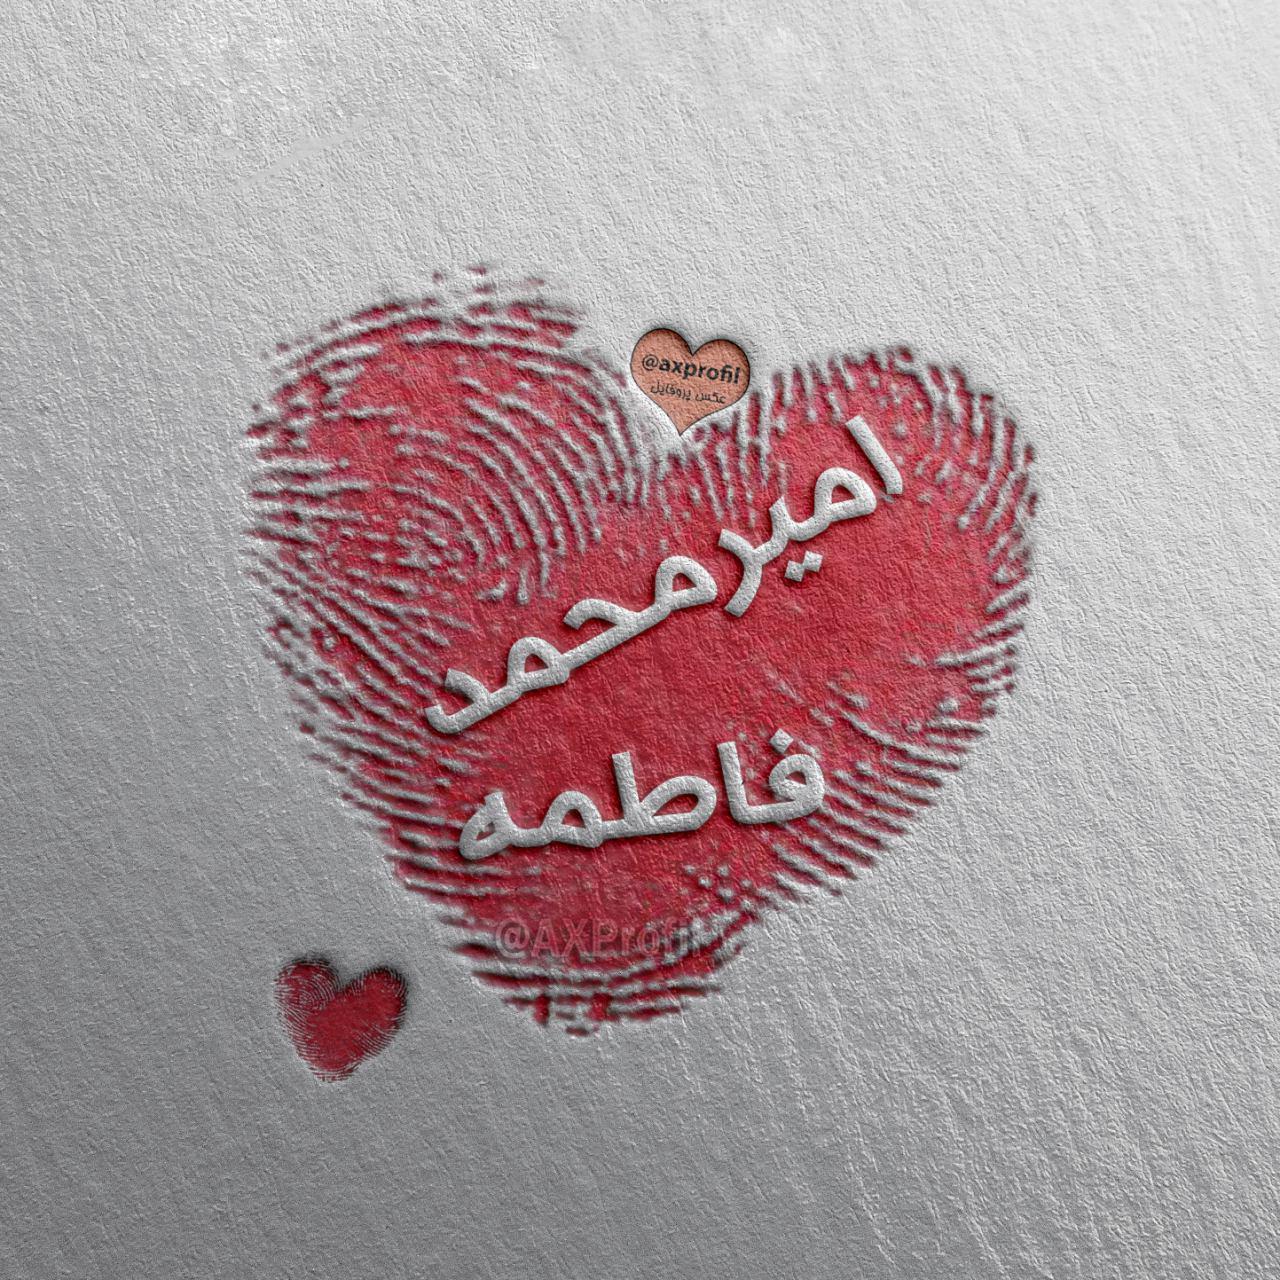 عکس پروفایل عاشقانه اسم امیرمحمد و فاطمه